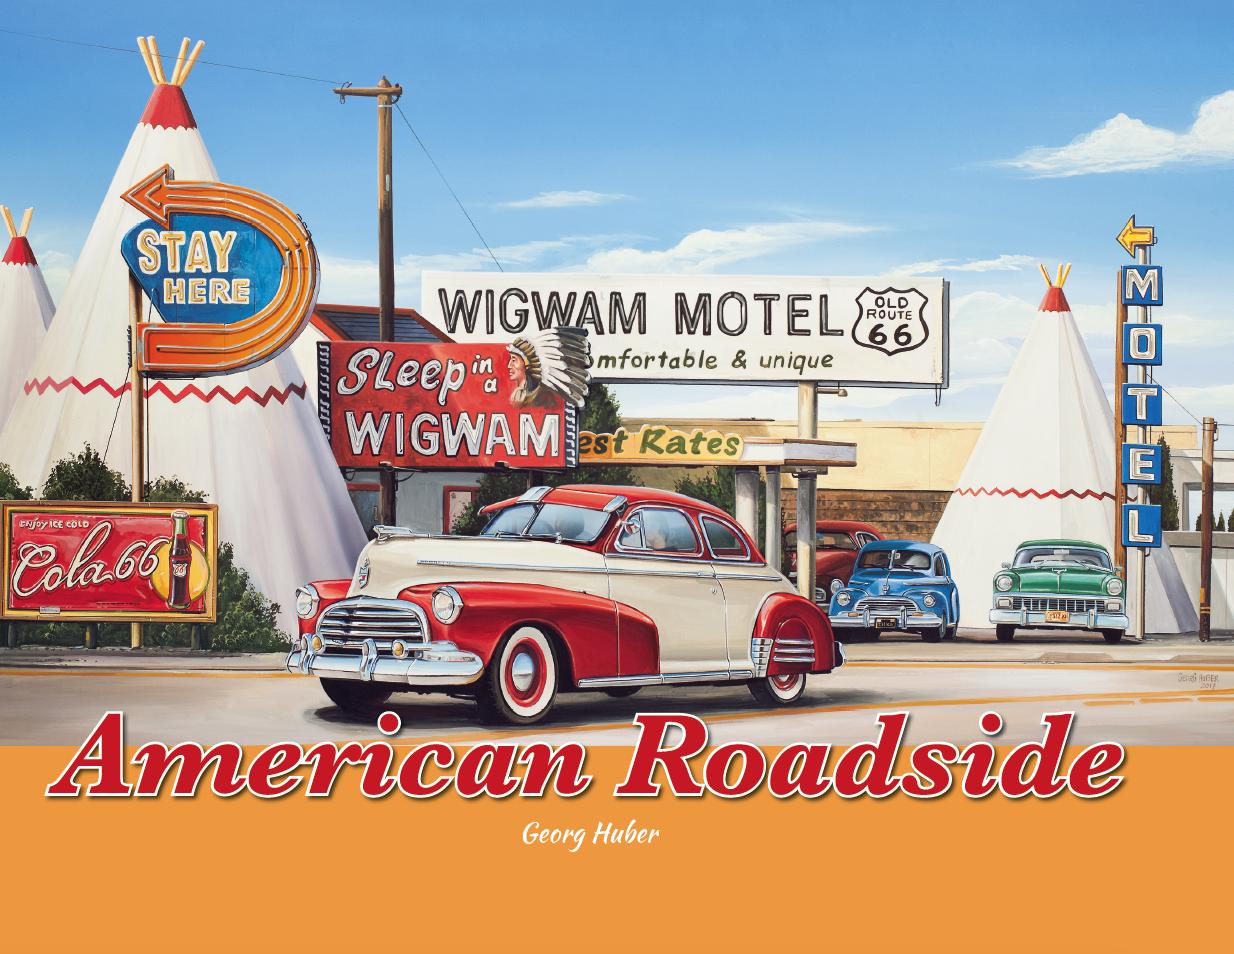 American Roadside: Neue bebilderte USA-Tour mit Georg Huber